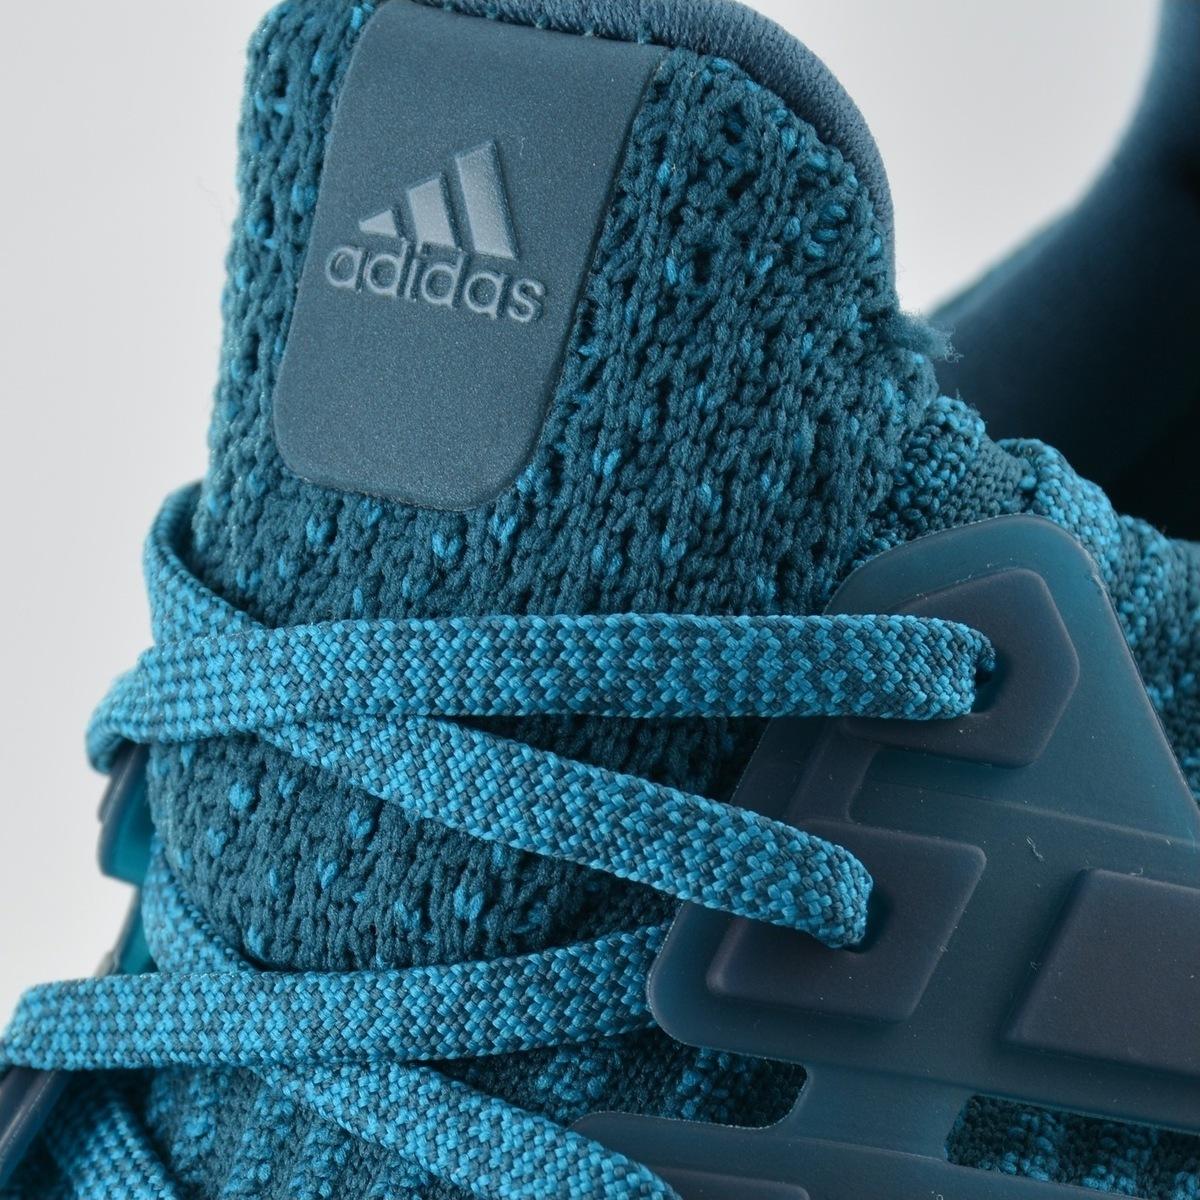 Adidas Ultraboost S82021